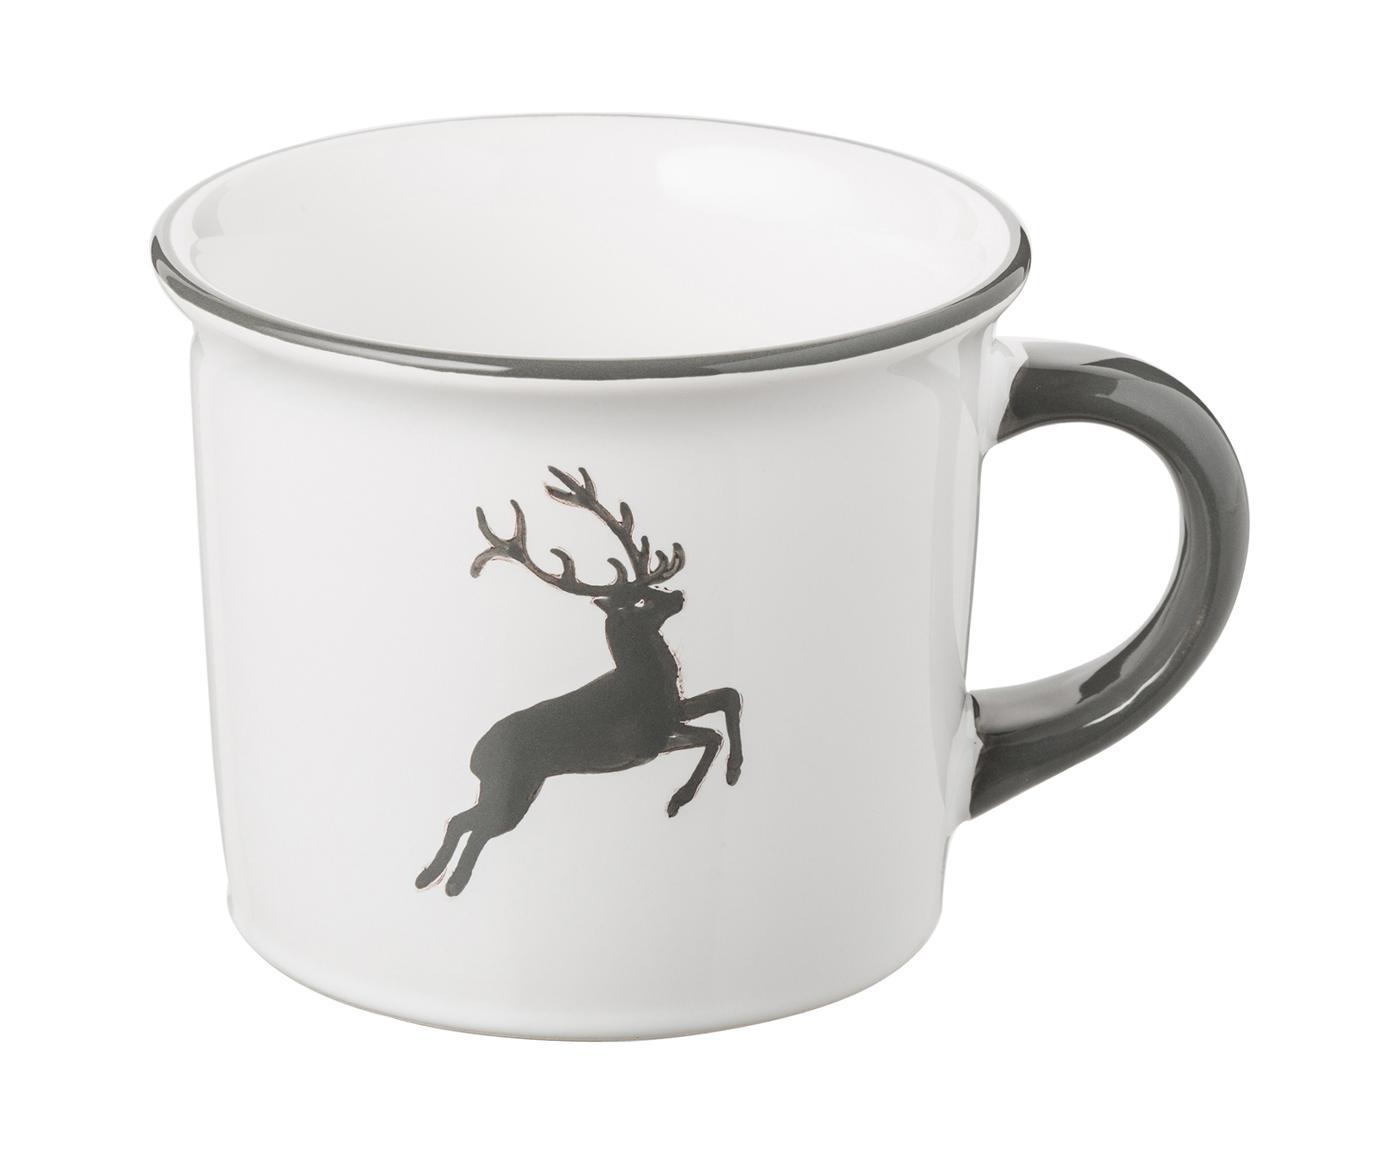 Kaffeehaferl Classic Grauer Hirsch, Keramik, Grau,Weiß, 240 ml